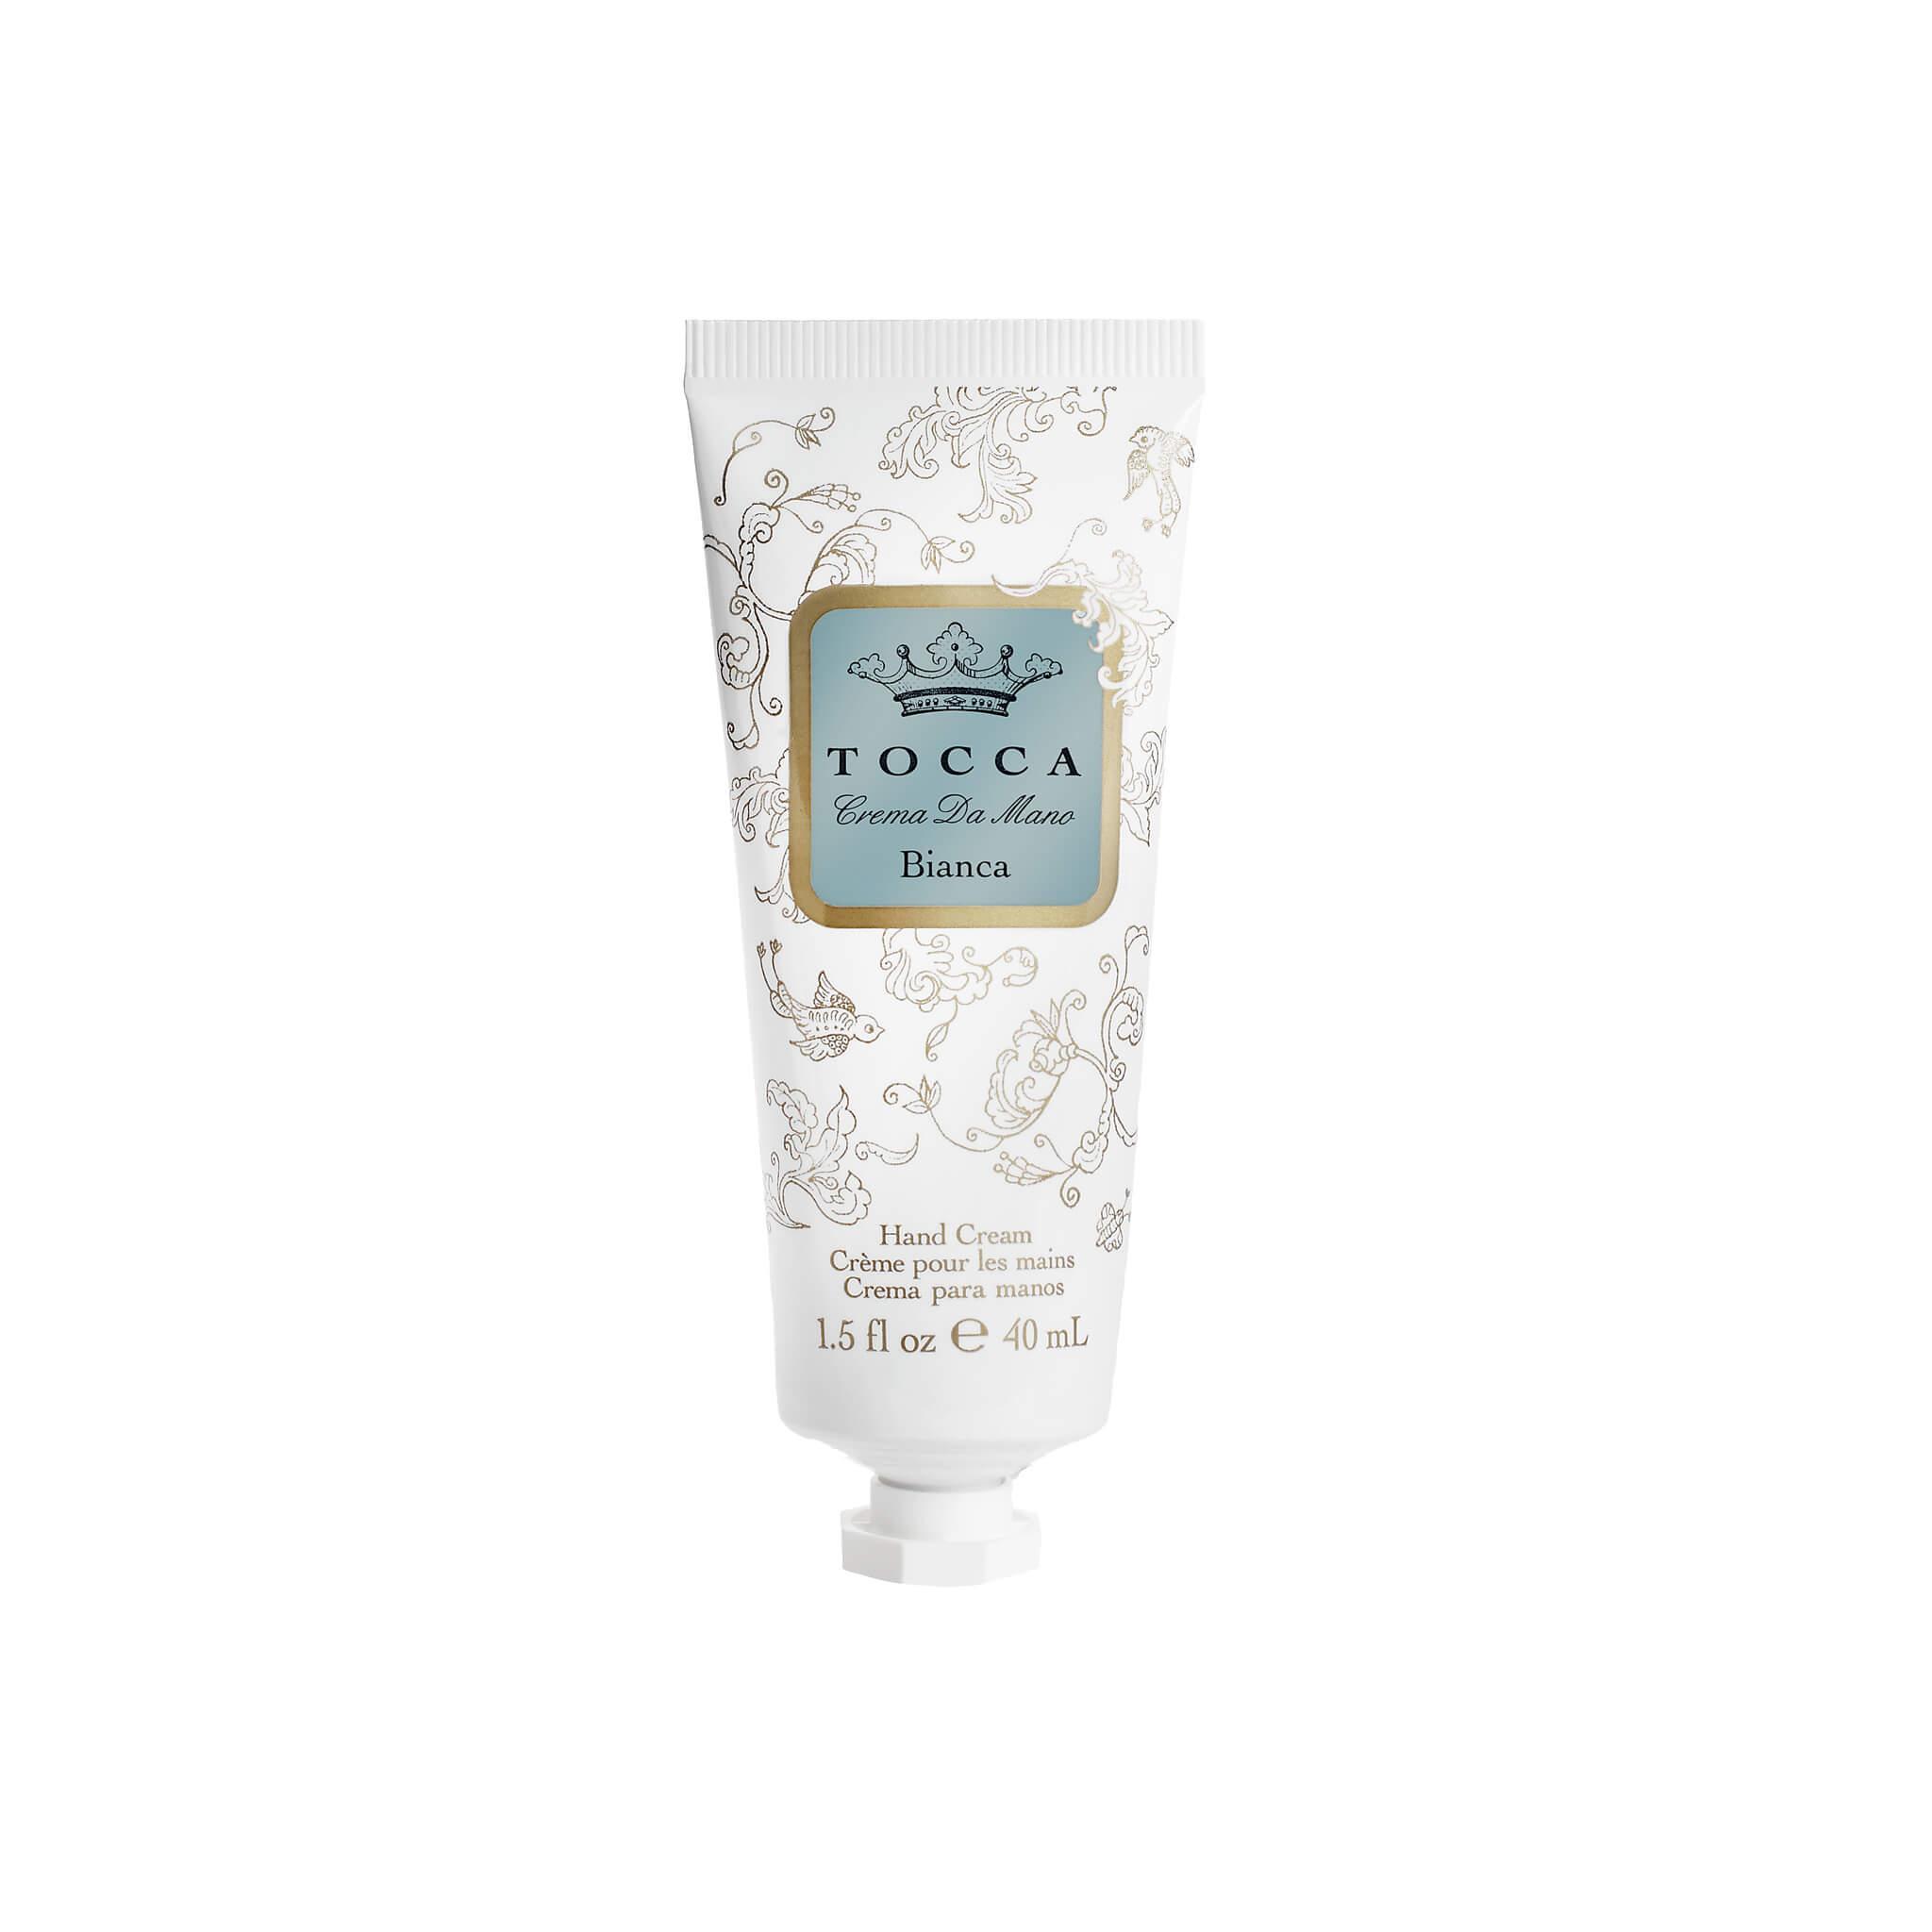 An image of Tocca Bianca Crema de Mano Hand Cream 40ml